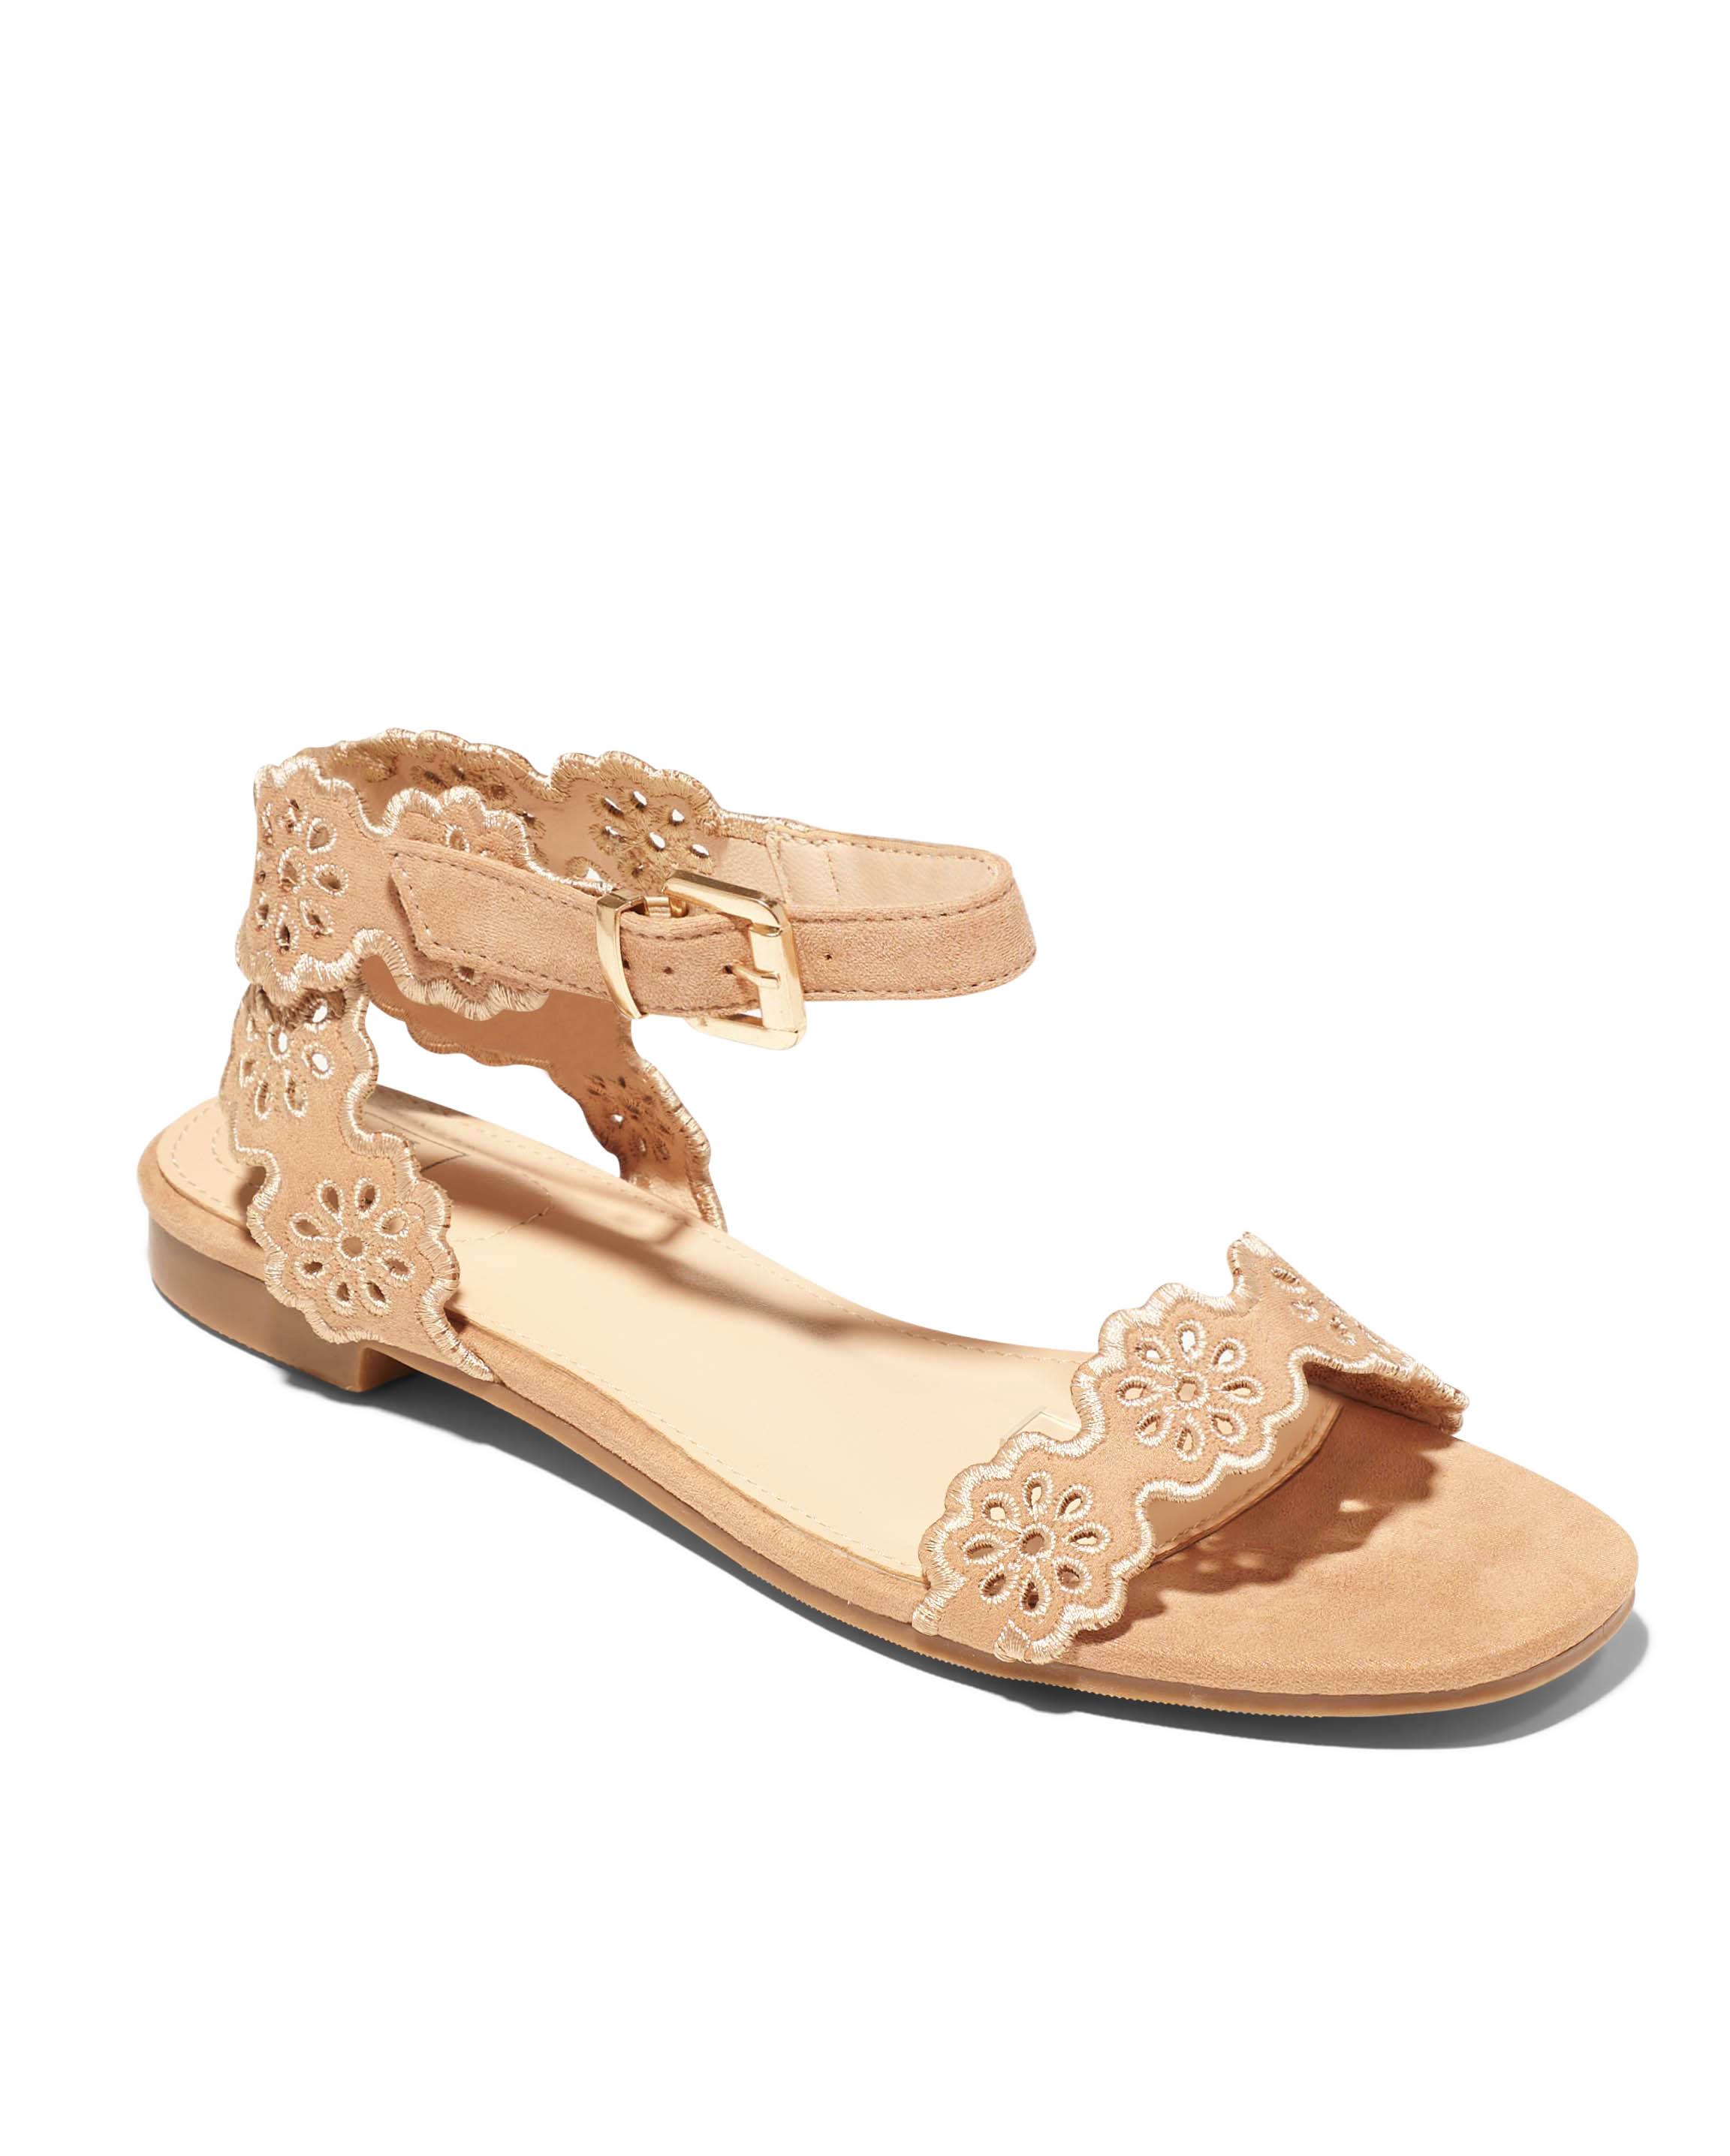 Sandales Plates Femme - Sandale Plate Nude Jina - Mgs5a-J21d